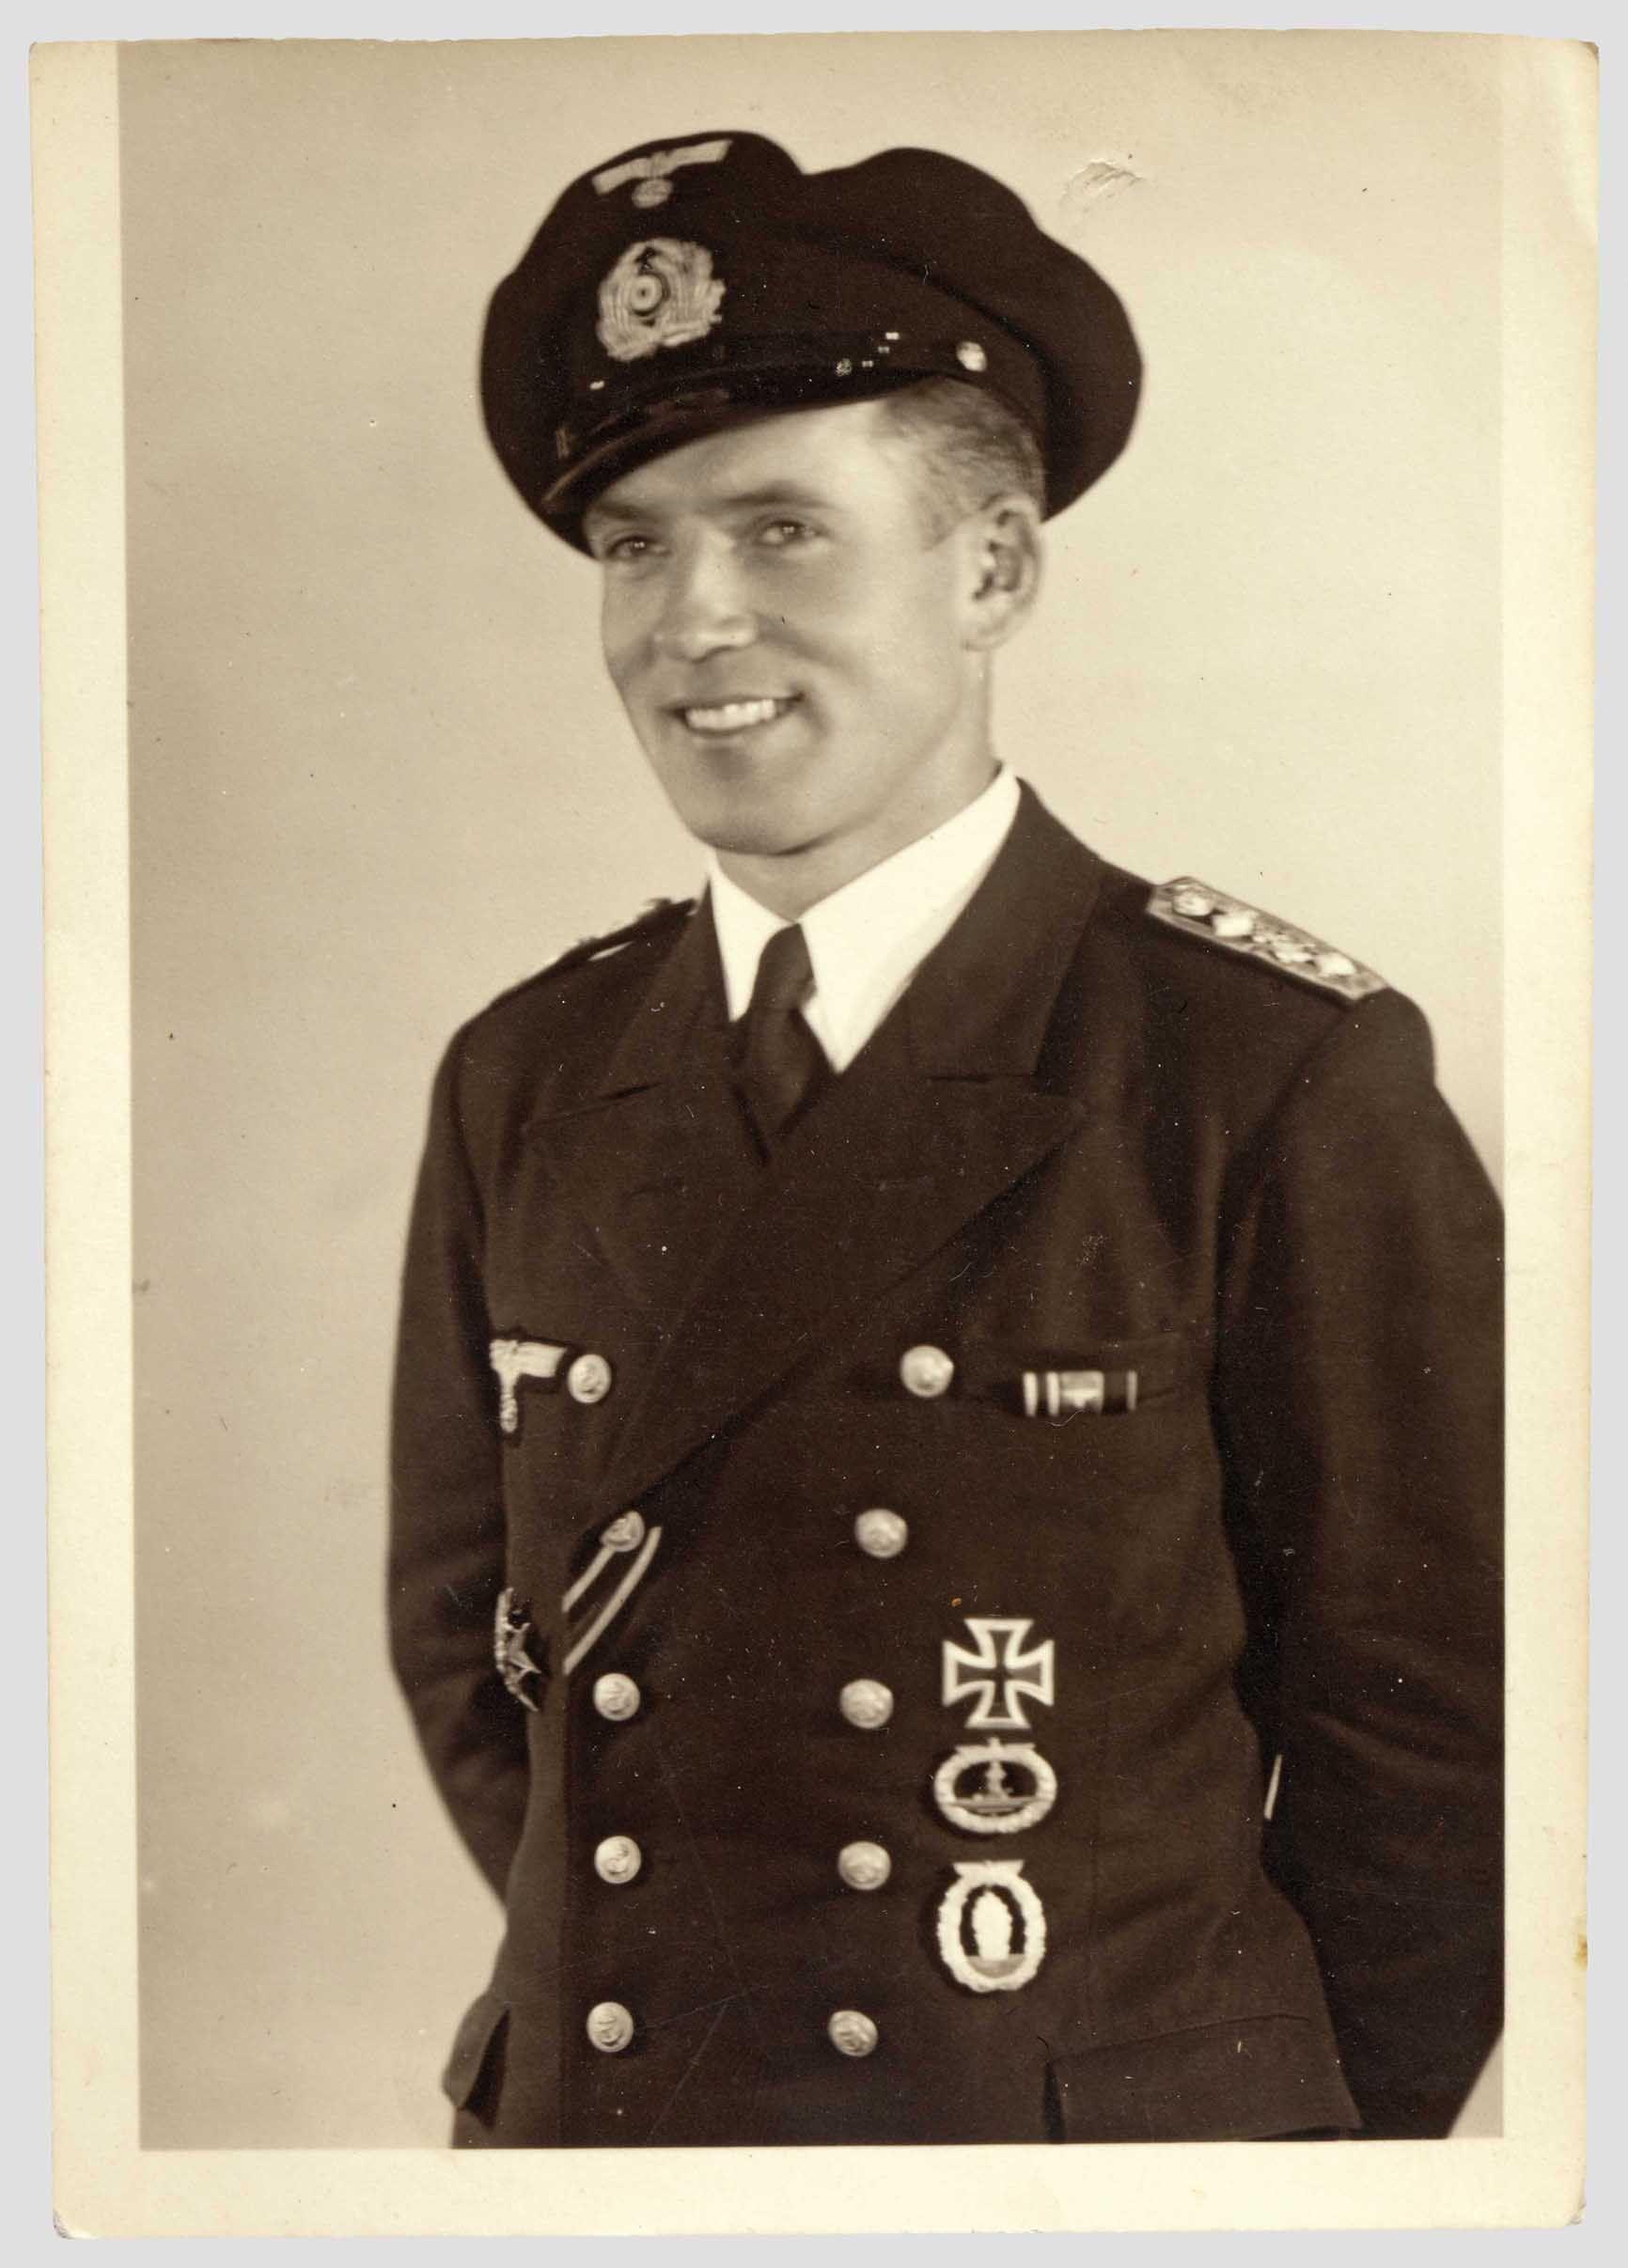 ■ Rudolf Zölk - DKiG: 17-5-44 - Tripulante del submarino U-123 (Hardegen)